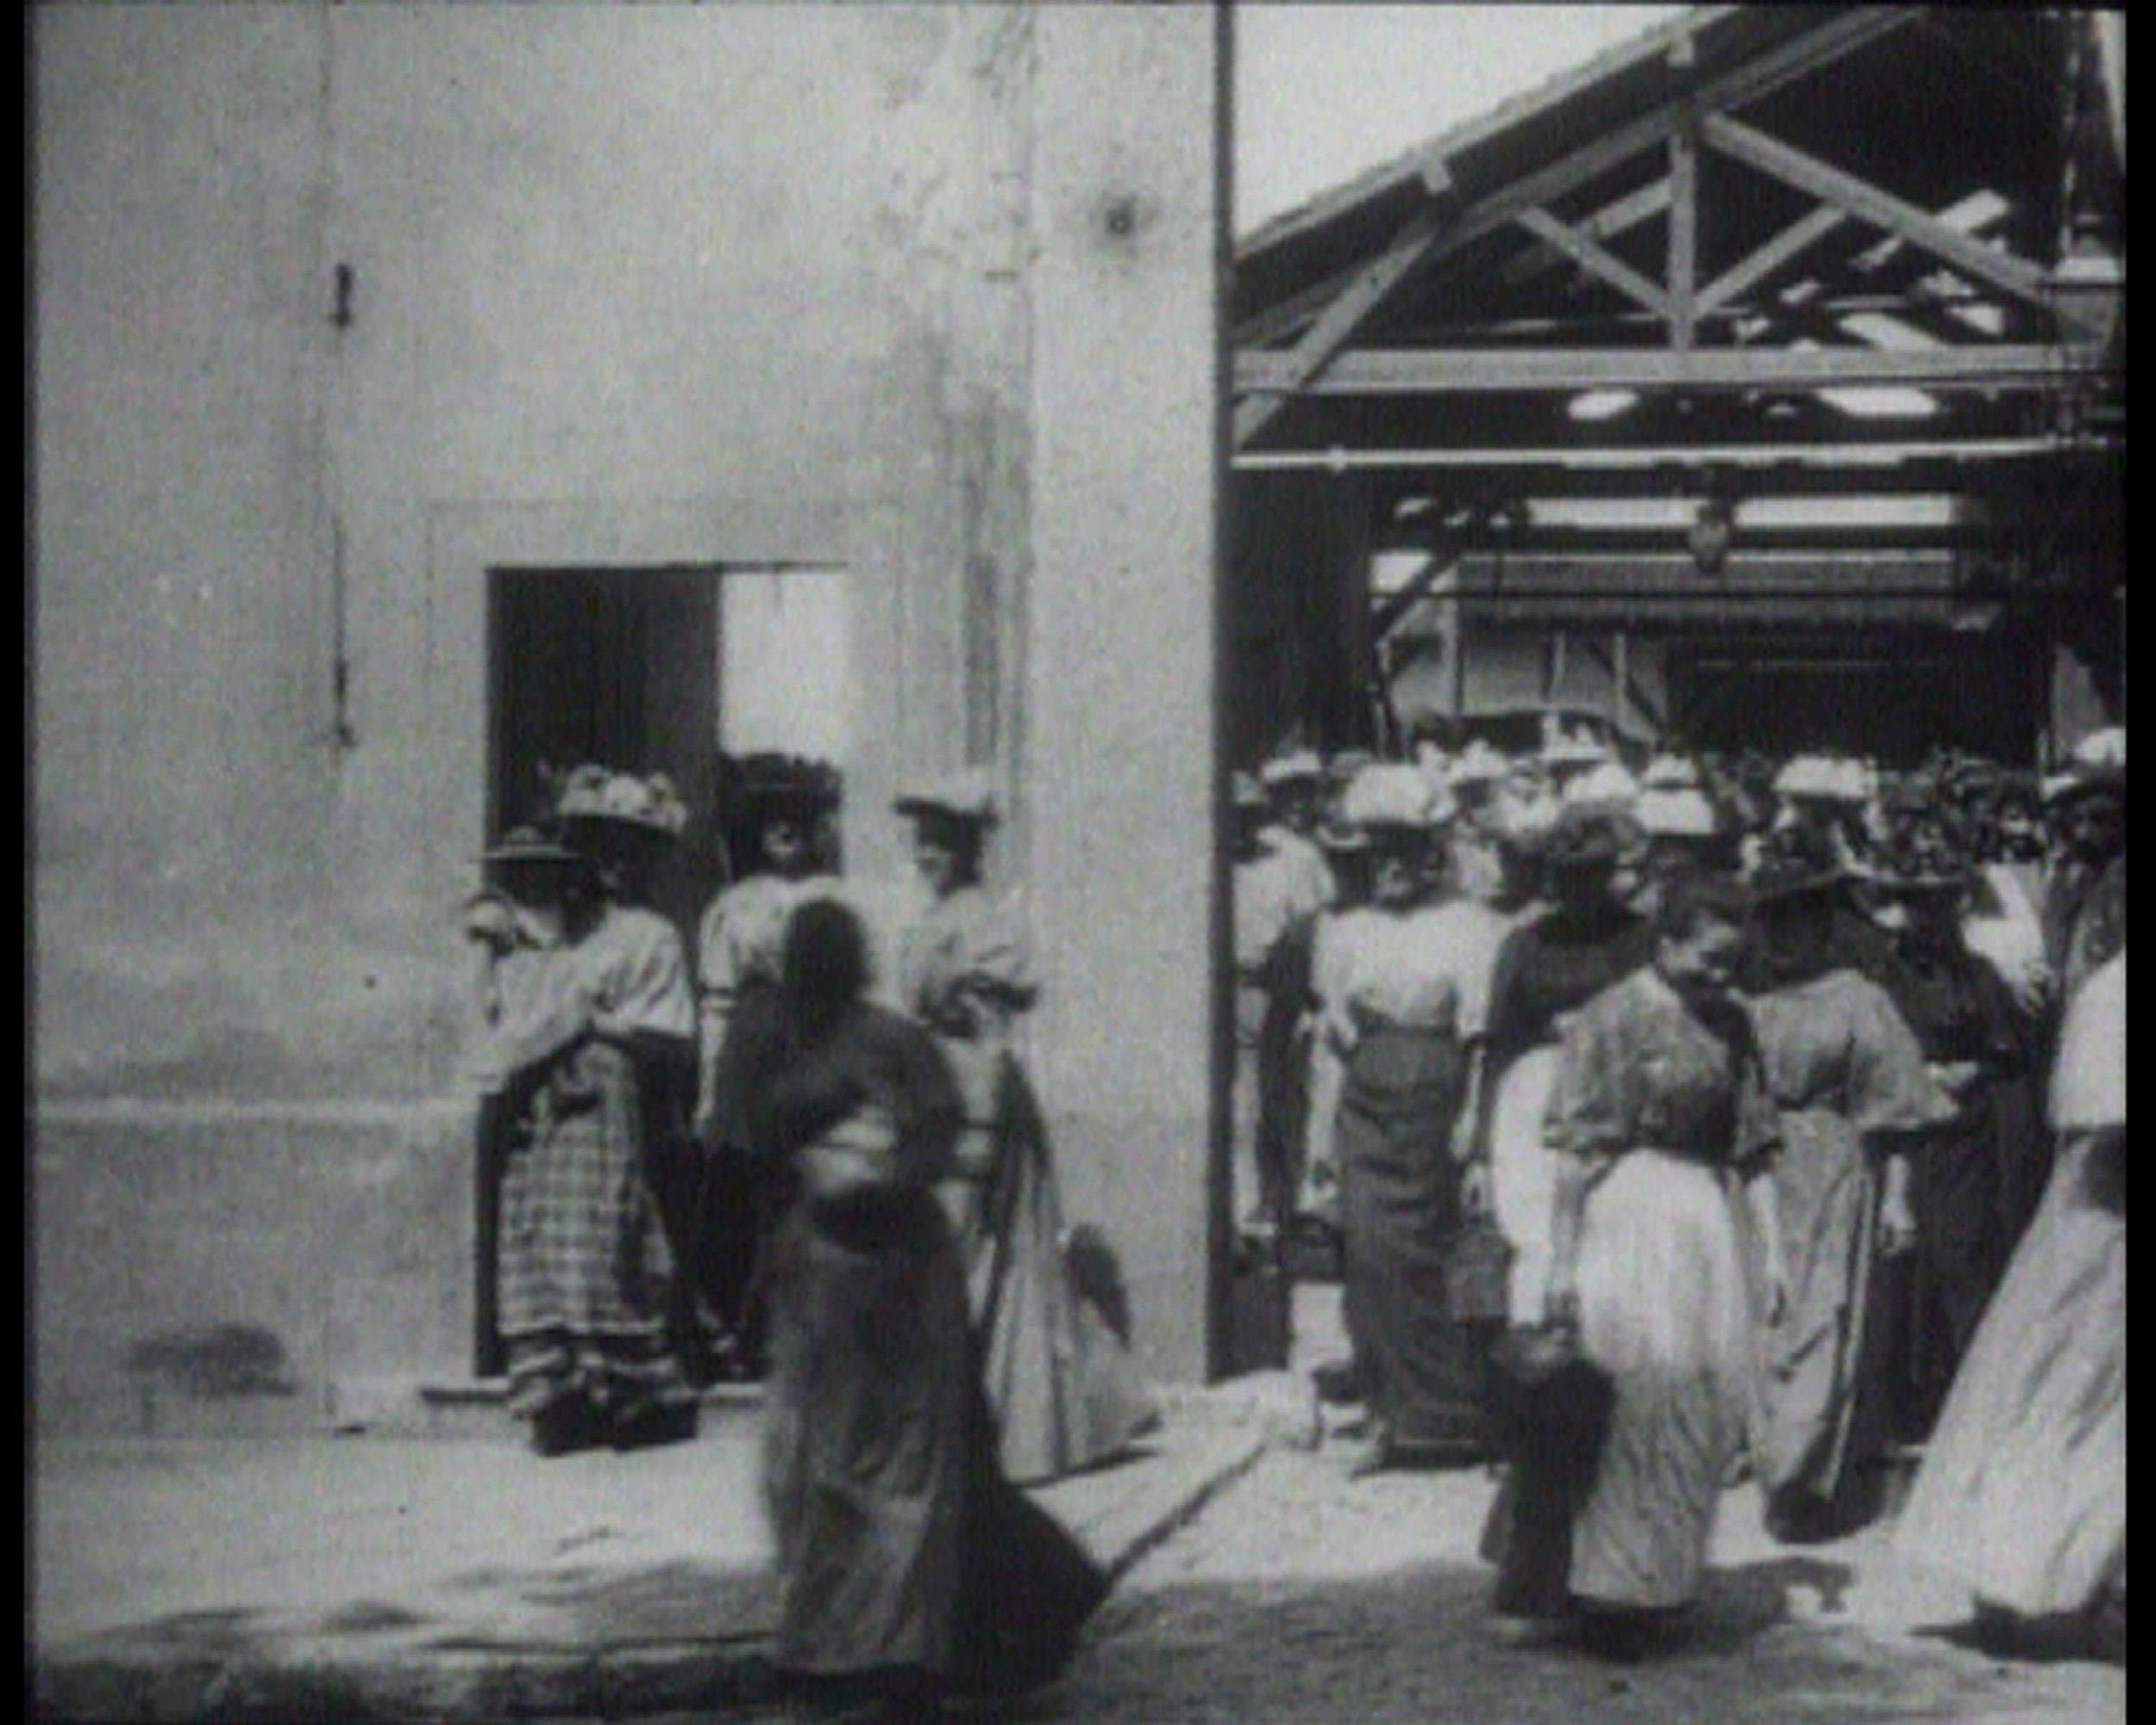 《工人离开工厂》,1995年,艺术家提供图片 Workers leaving the Factory, 1995, ©Harun Farocki 《工人离开工厂》是电影史上第一部公开放映的电影的名字。时长45秒,这部片子展现了里昂卢米埃兄弟的摄影产品工厂里的工人,摩肩接踵,匆匆从工厂大门的阴影中走出来,进入到下午的阳光里。只有在这里,工人们匆匆离去,他们才可视为一个社会群体。但是,他们要去往何处?去参加一个集会?还是遇见一个街垒?或是回家?这些问题被一代又一代的纪录片制作人所关注。工厂大门前的空间则一直被当做社会冲突的场景。而且,这部片子已成为电影史上叙事媒介的一个代表作品。在法罗基关于纪录片所作的同名文章中,他通过电影史探讨了这个场景。这一努力的结果就是成就了一篇从摄影媒介本身出发的出色电影分析,范围涉及广泛,从卓别林的《摩登时代》到弗里茨·朗的《大都会》,再到帕索里尼的《寄生虫》。如法罗基的电影所示,卢米埃兄弟的片子在其内部就蕴含着可预见的社会发展之萌芽:这种形式的工业劳动会终将消失殆尽。(克劳斯·格林豪恩,Hildesheimer Allgemeine Zeitung,1995年11月21日)。 Workers Leaving the Factory - such was the title of the first cinema film ever shown in public. For 45 seconds, this stillexistant sequence depicts workers at the photographic products factory in Lyon owned by the brothers Louis and Auguste Lumière hurrying, closely packed, out of the shadows of the factory gates and into the afternoon sun. Only here, in departing, are the workers visible as a social group. But where are they going? To a meeting? To the barricades? Or simply home? These questions have preoccupied generations of documentary filmmakers. For the space before the factory gates has always been the scene of social conflicts. And furthermore, this sequence has become an icon of the narrative medium in the history of the cinema. In his documentary essay of the same title, Harun Farocki explores this scene right through the history of film. The result of this effort is a fascinating cinematographic analysis in the medium of cinematography itself, ranging in scope from Chaplin's Modern Times to Fritz Lang's Metropolis to Pier Paolo Pasolini's Accattone!. Farocki's film shows that the Lumière brothers' sequence already carries within itself the germ of a foreseeable social development: the eventual disappearance of this form of industrial labor. (Klaus Gronenborn, Hildesheimer Allgemeine Zeitung, November 21, 1995)